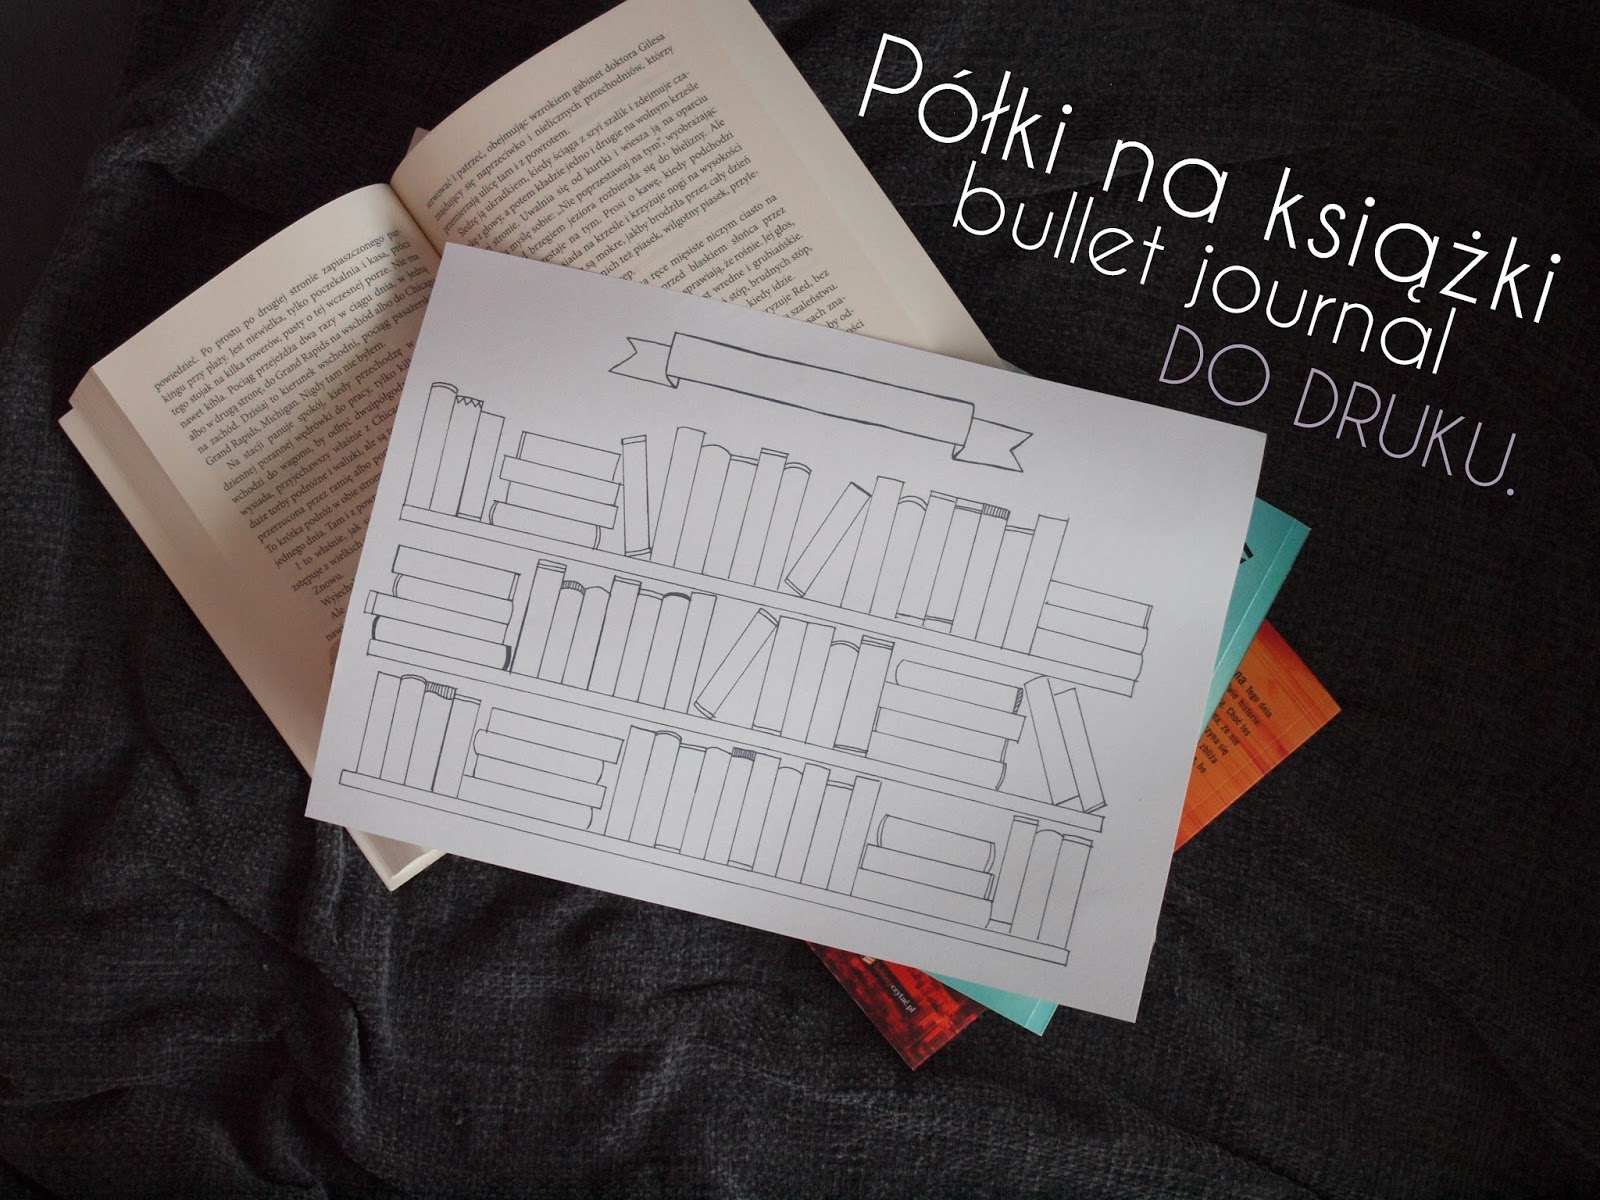 Do druku: Półki na książki / bullet journal.